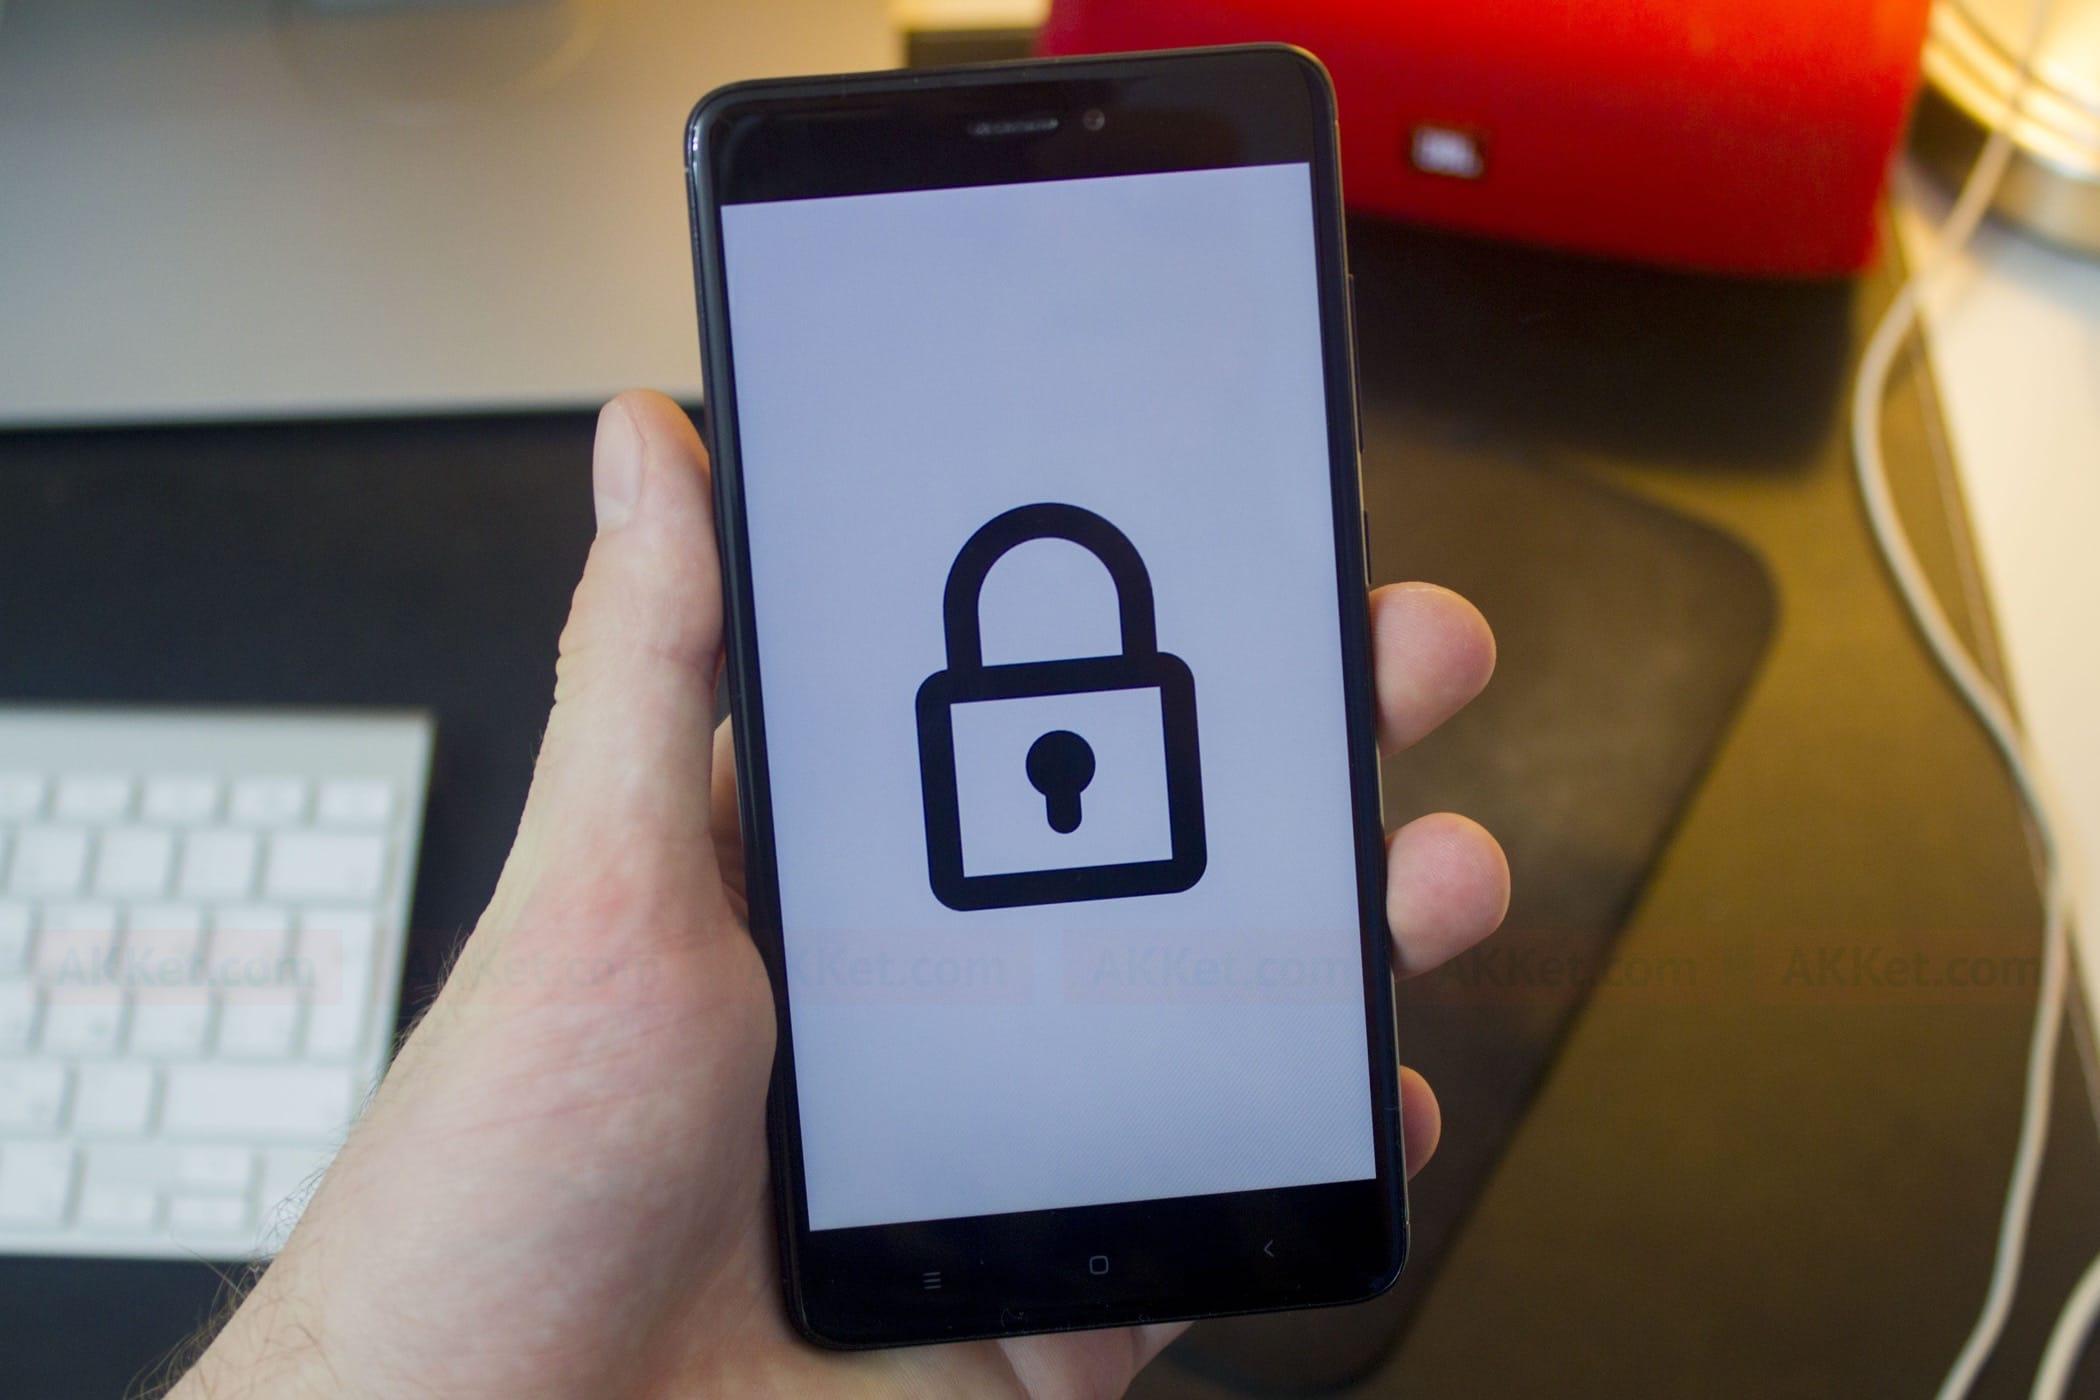 SHifrovanie-Android-Kak-vklyuchit-44.jpg